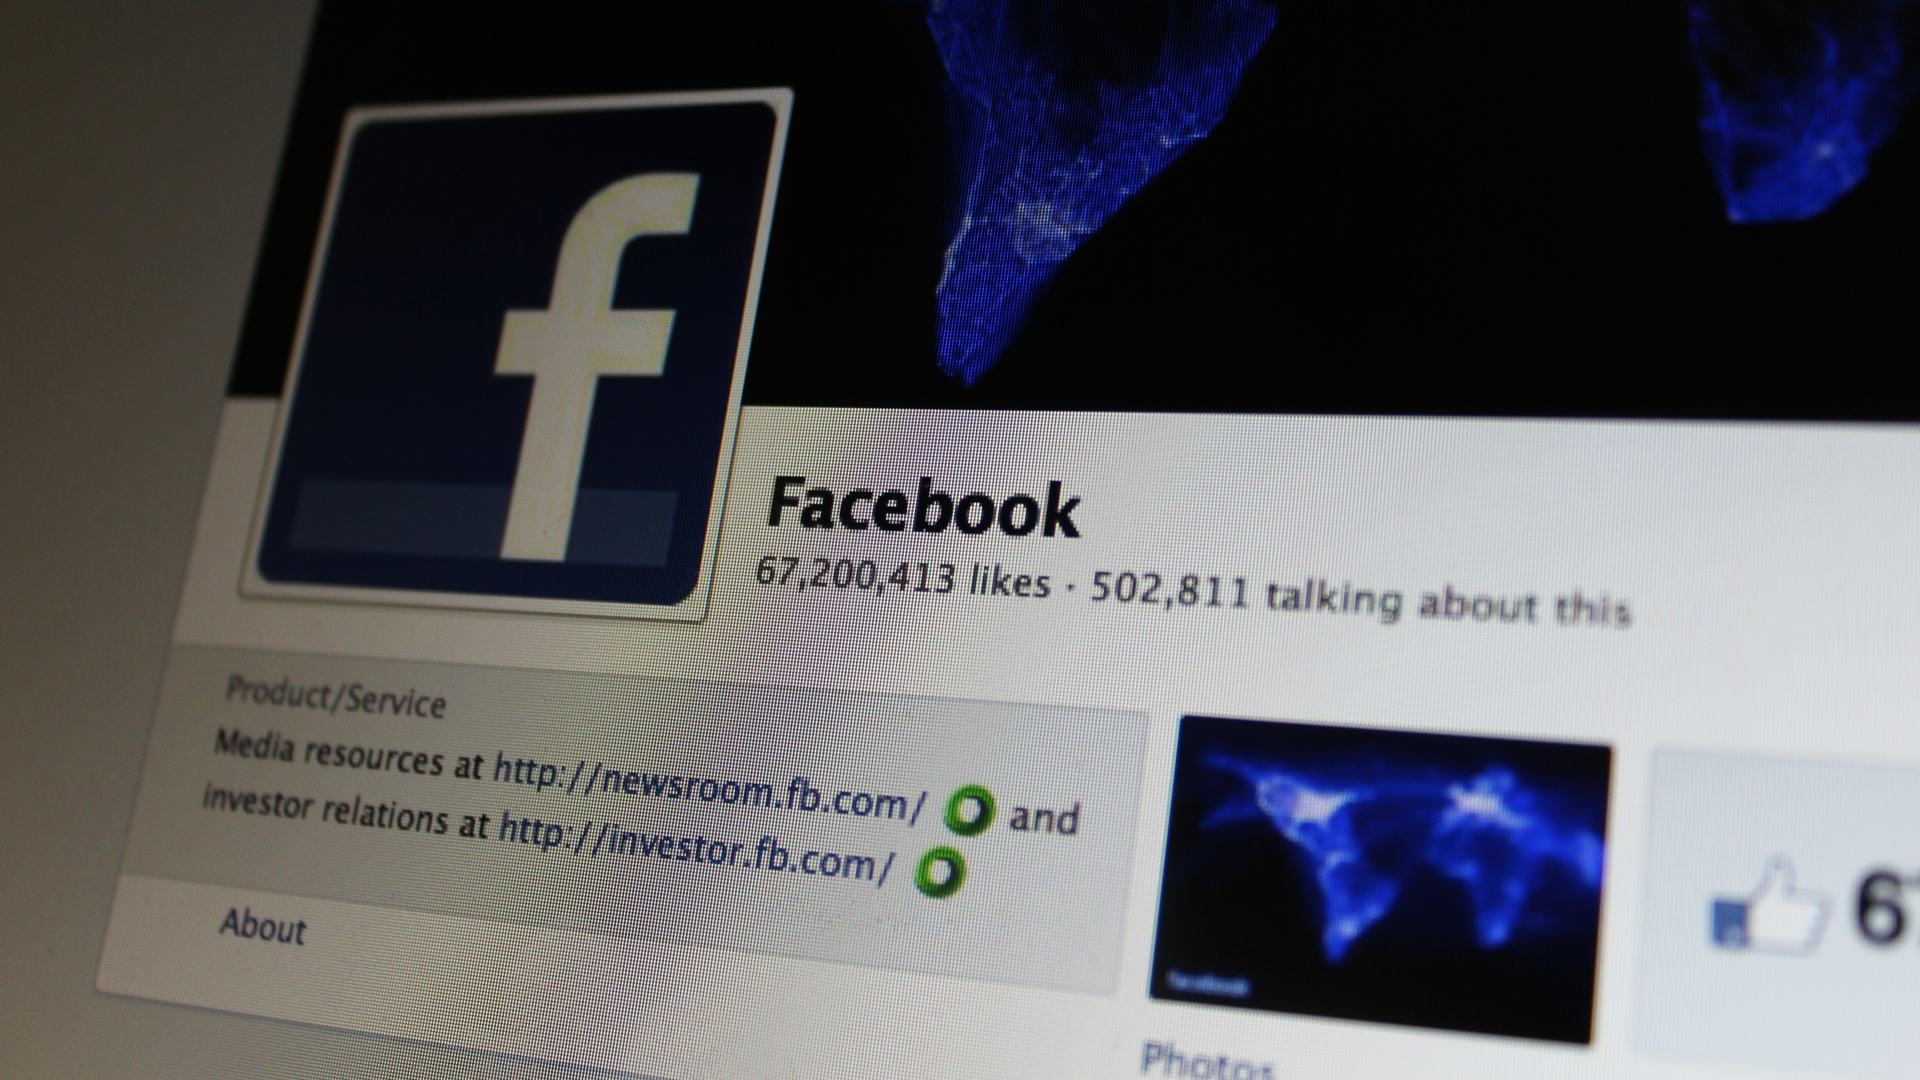 Facebook, Soziale Medien, Netzwerk